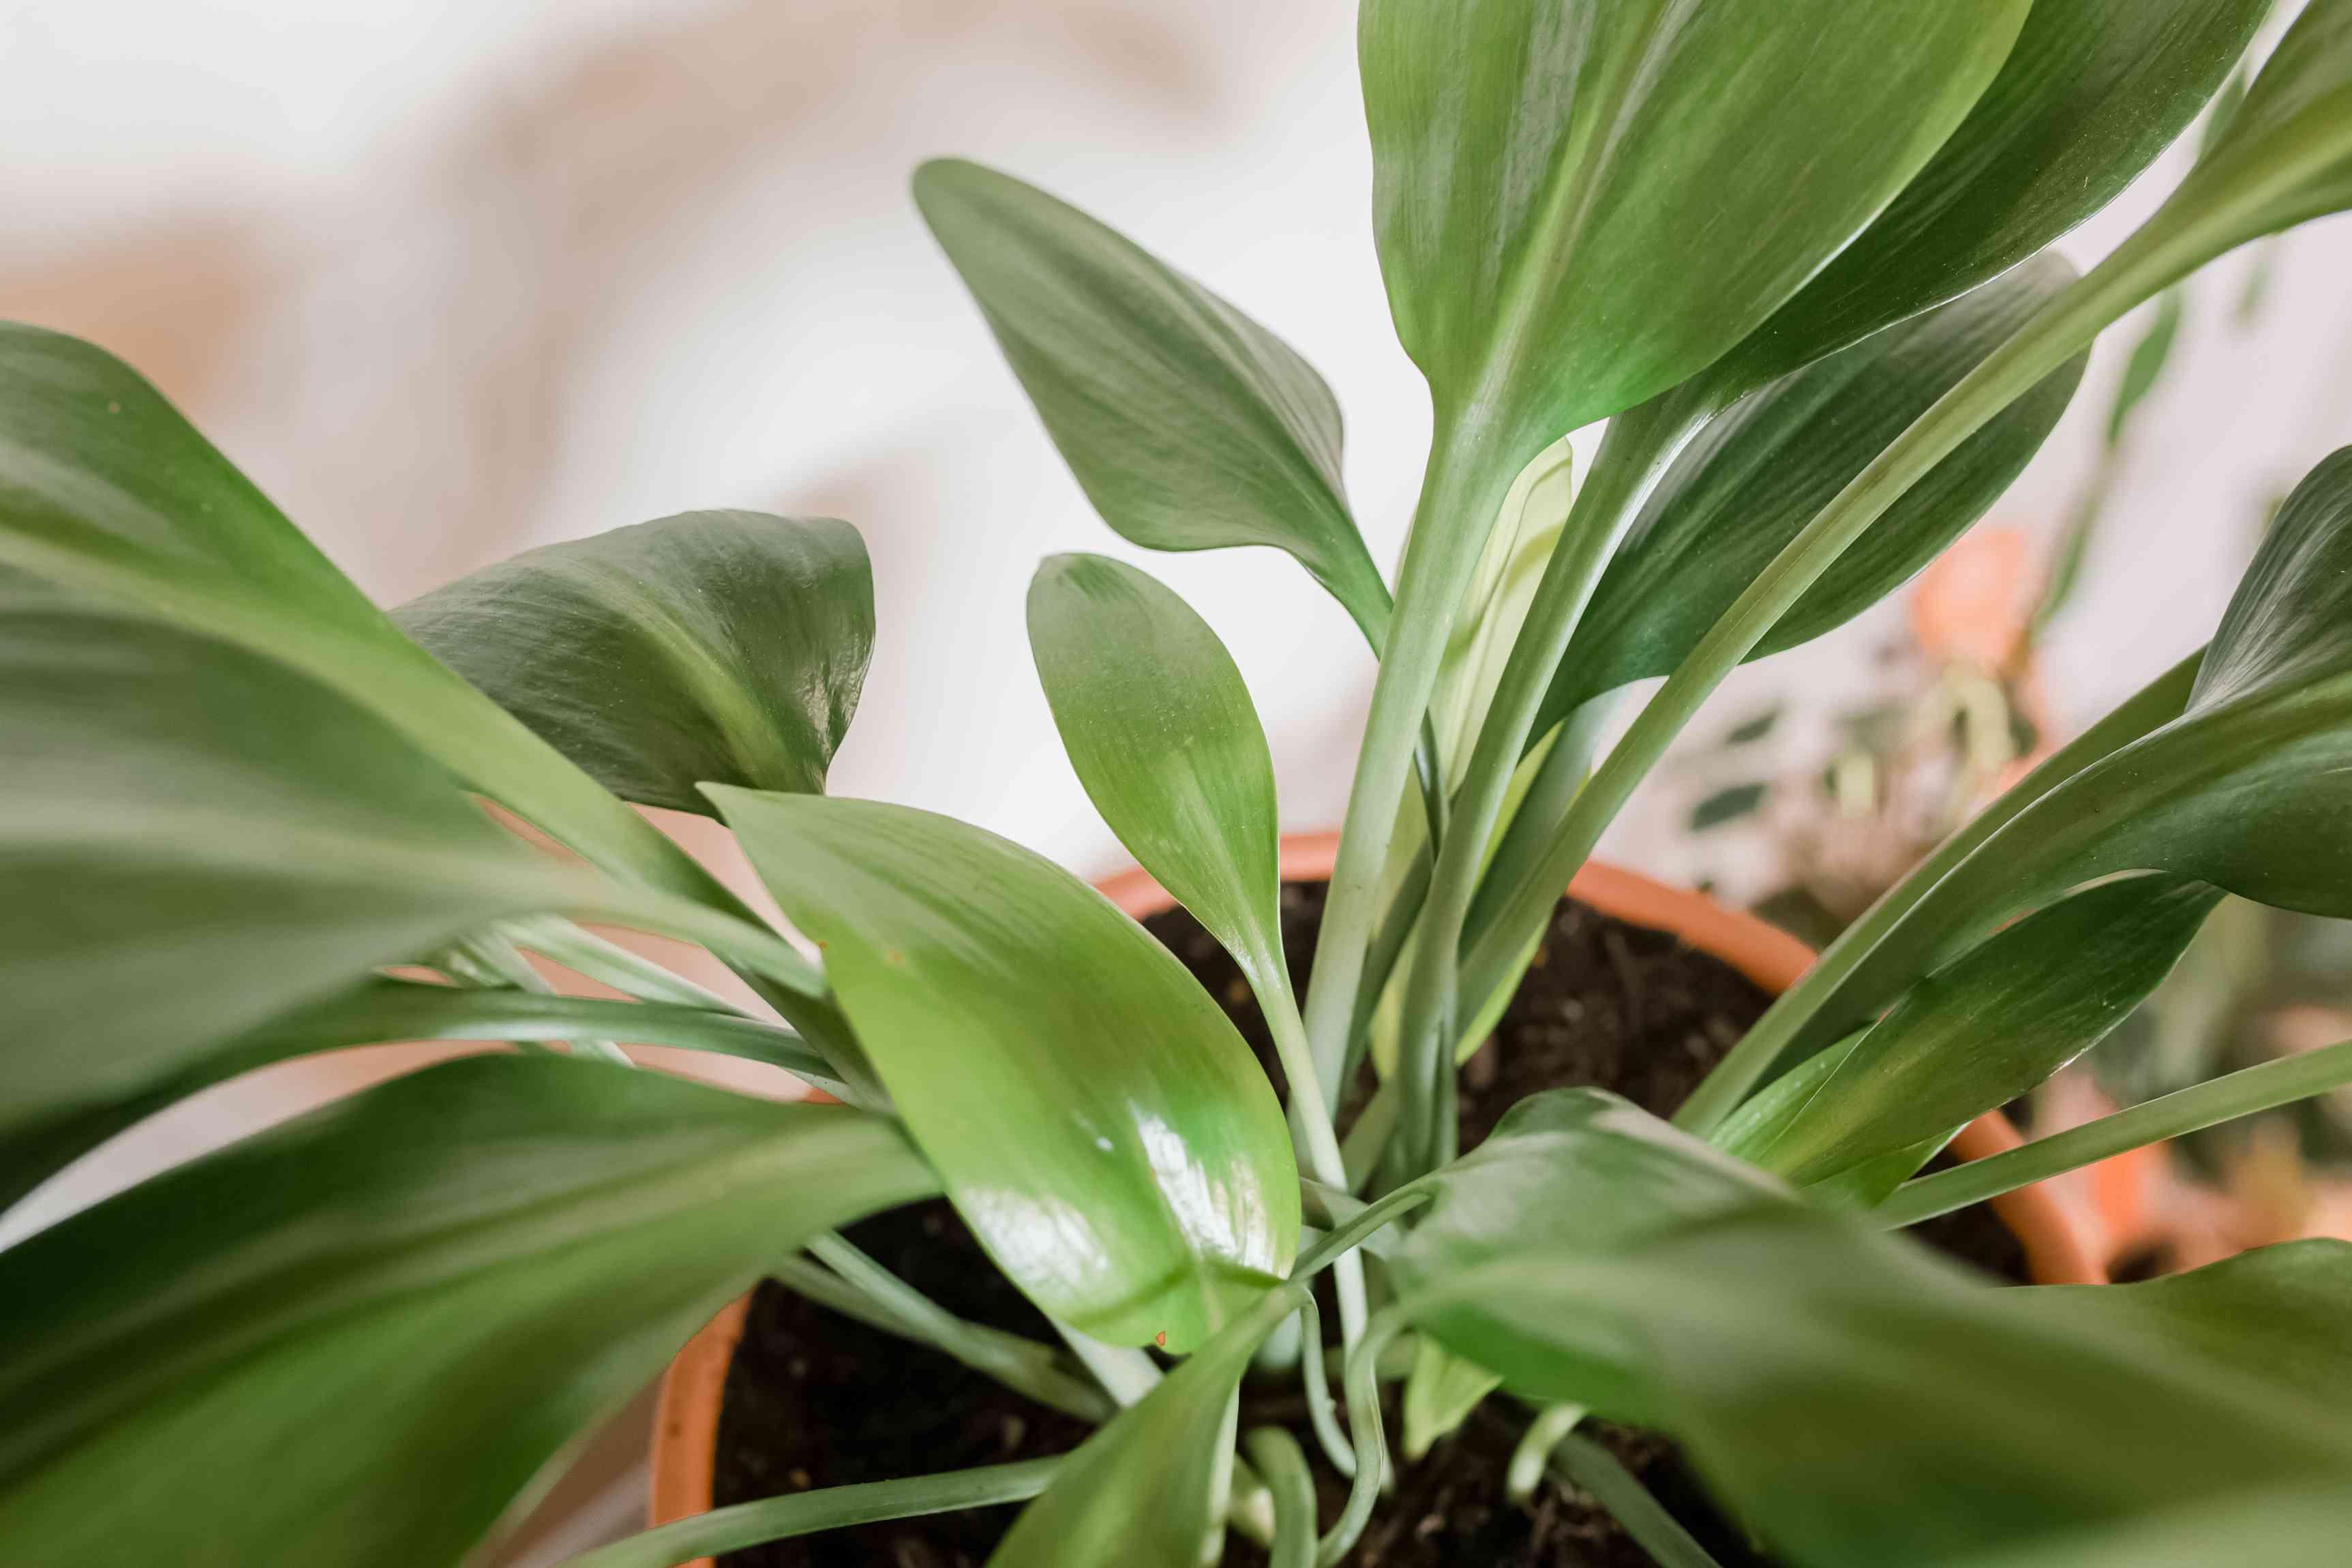 cast iron plant leaves